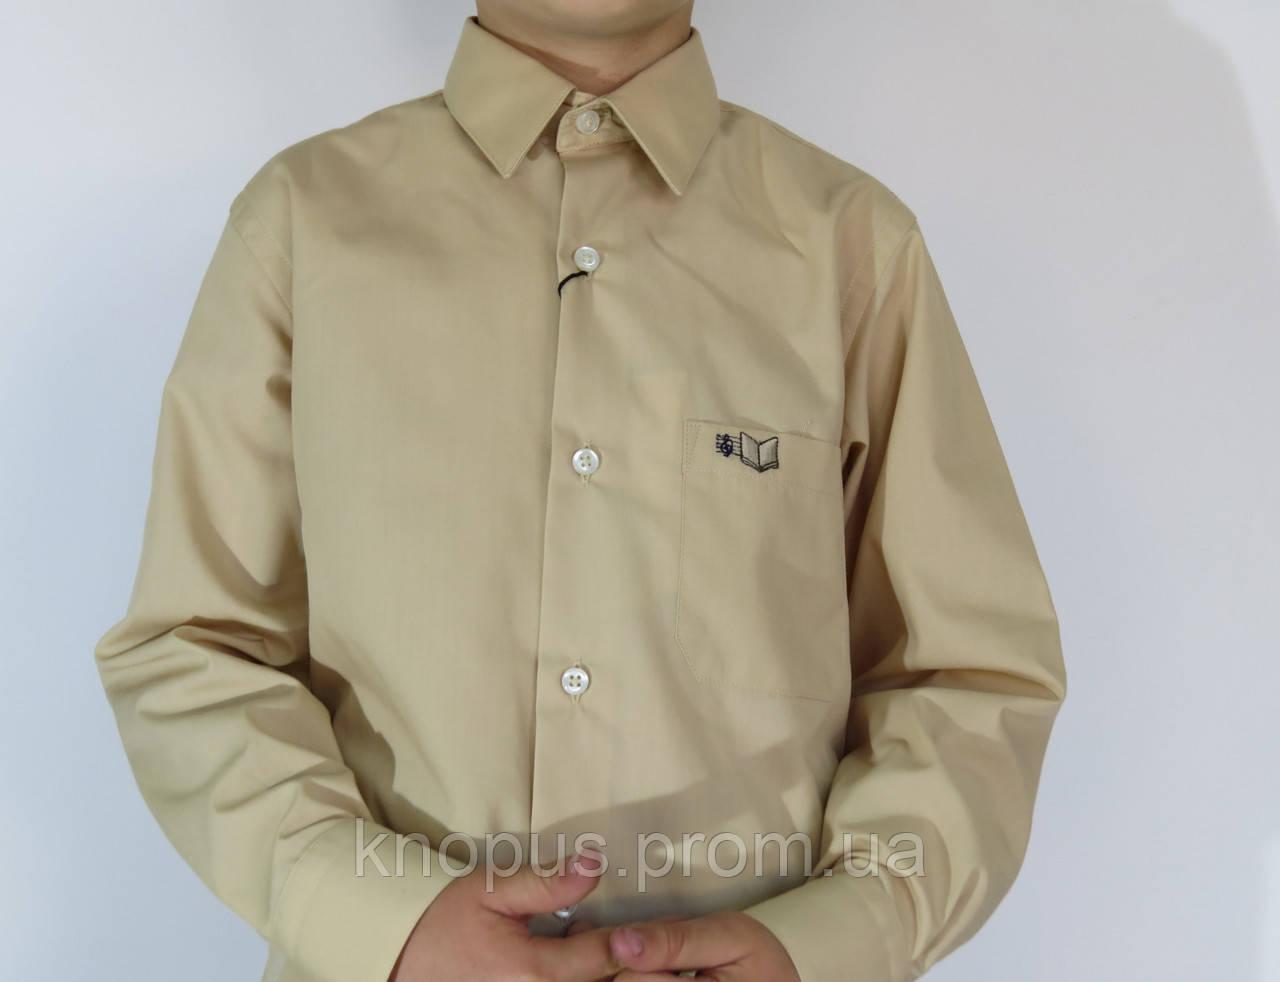 Рубашка для мальчика бежевая с вышивкой на кармане, Davanti, Украина. Размерный ряд 6-18 лет.